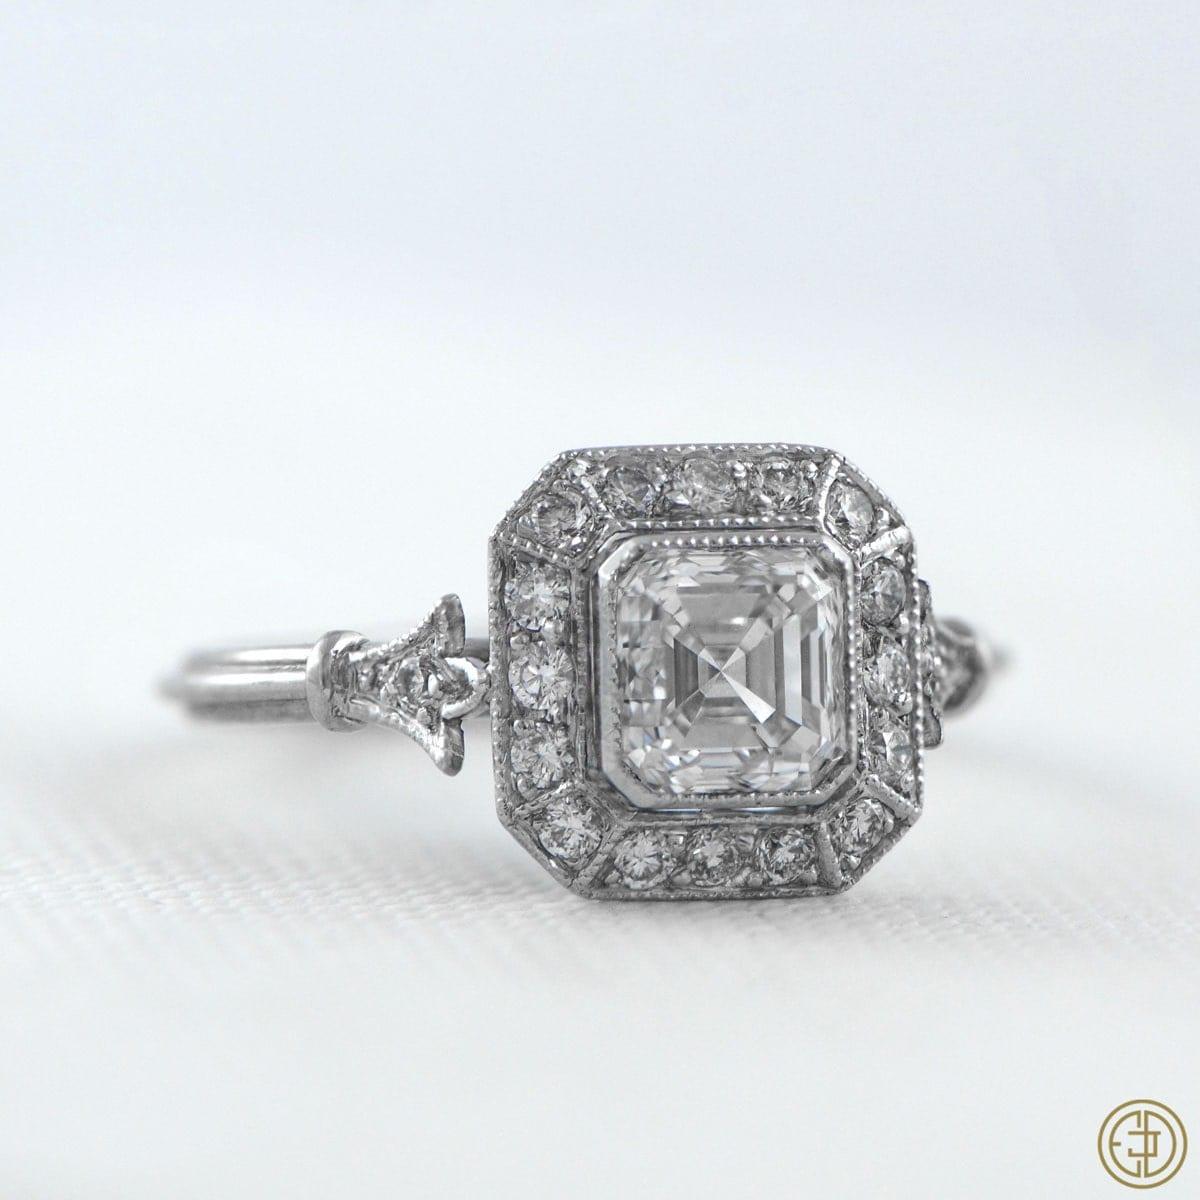 Vintage Style Asscher Cut Diamond by EstateDiamondJewelry on Etsy